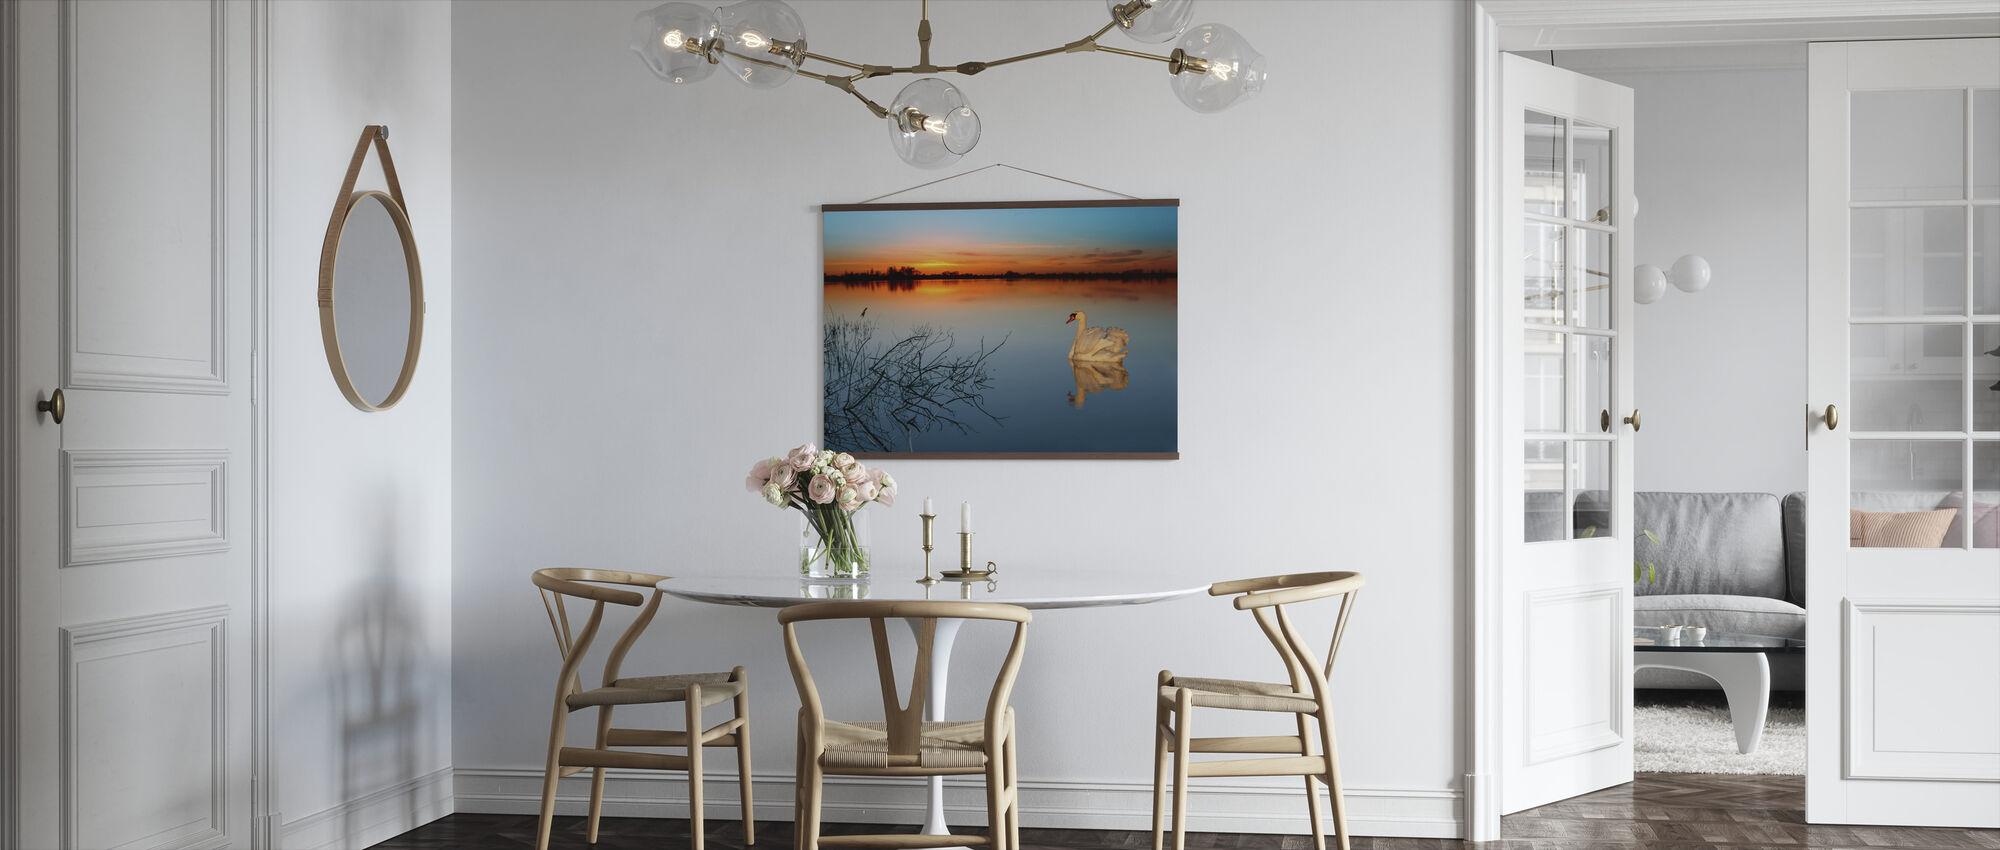 Swan on a lake - Poster - Kitchen